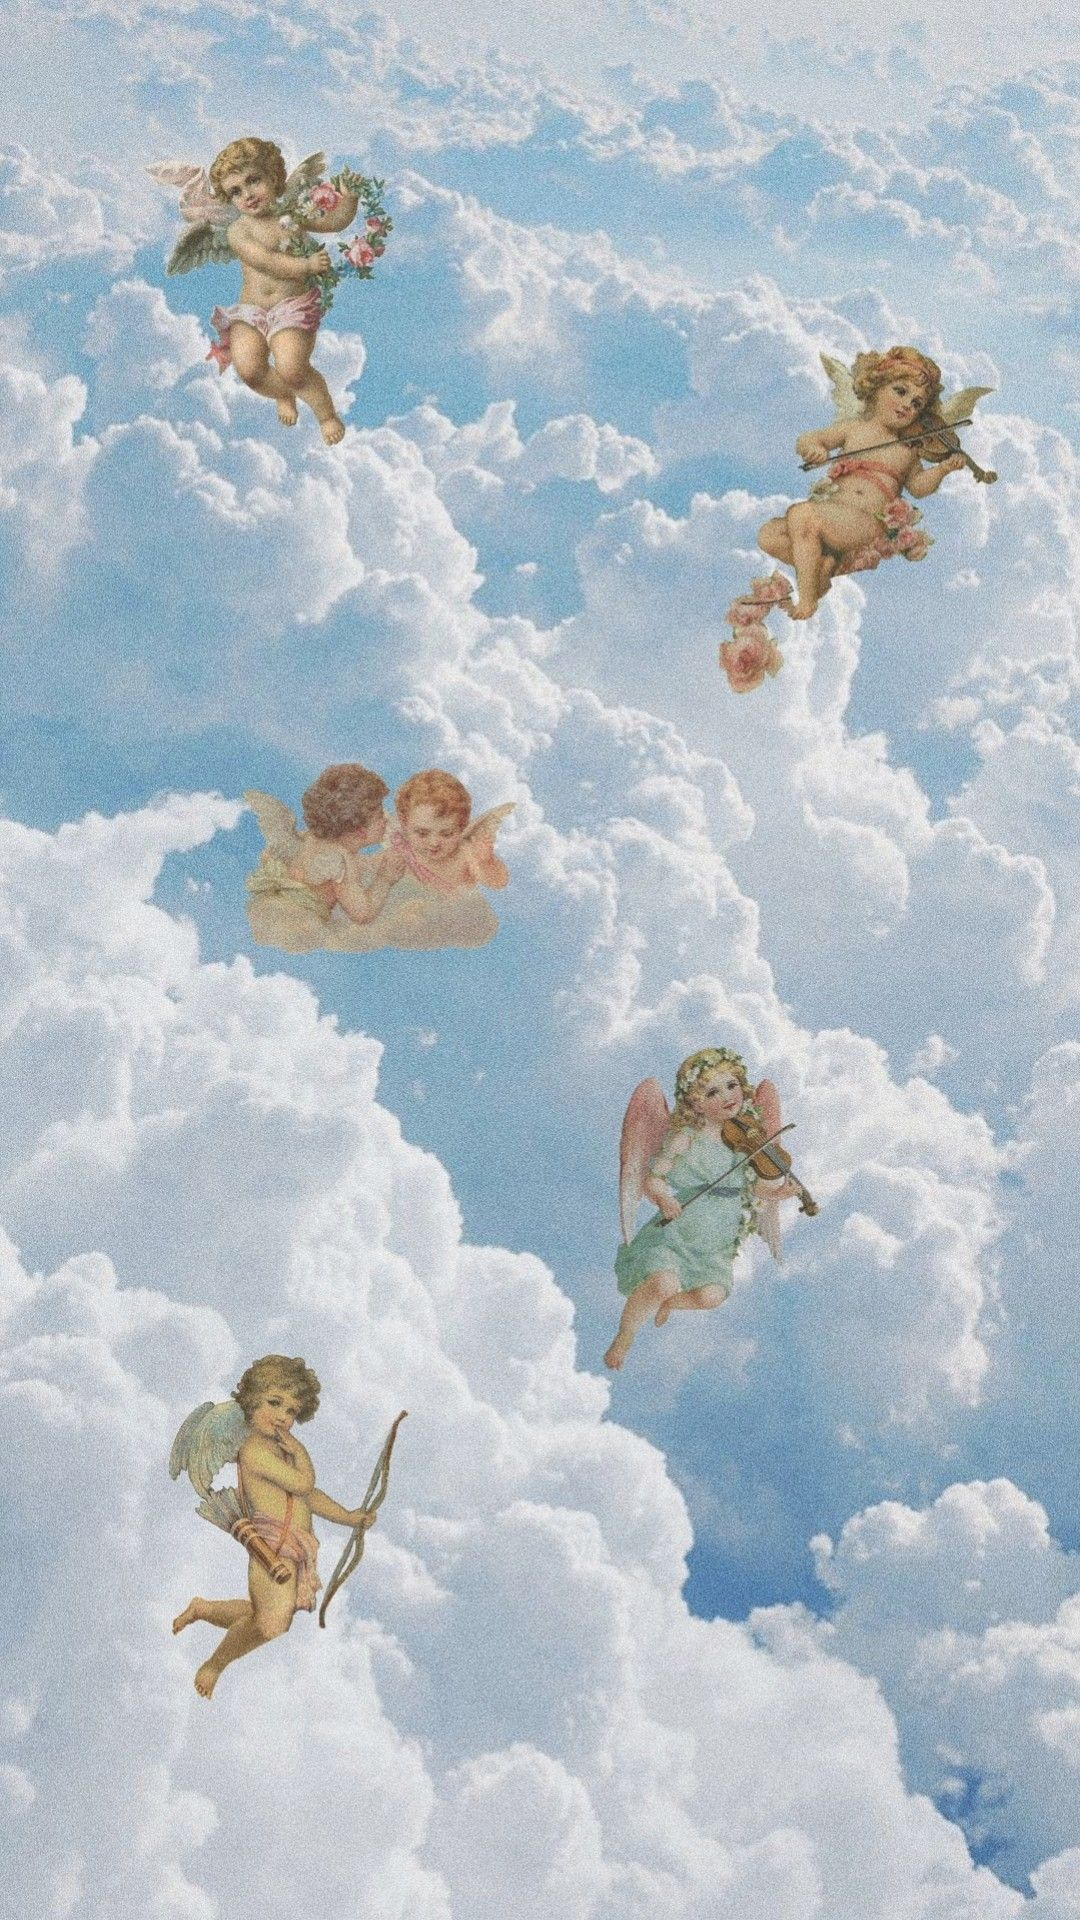 Aesthetic Angel Wallpapers   Top Aesthetic Angel Backgrounds 1080x1920